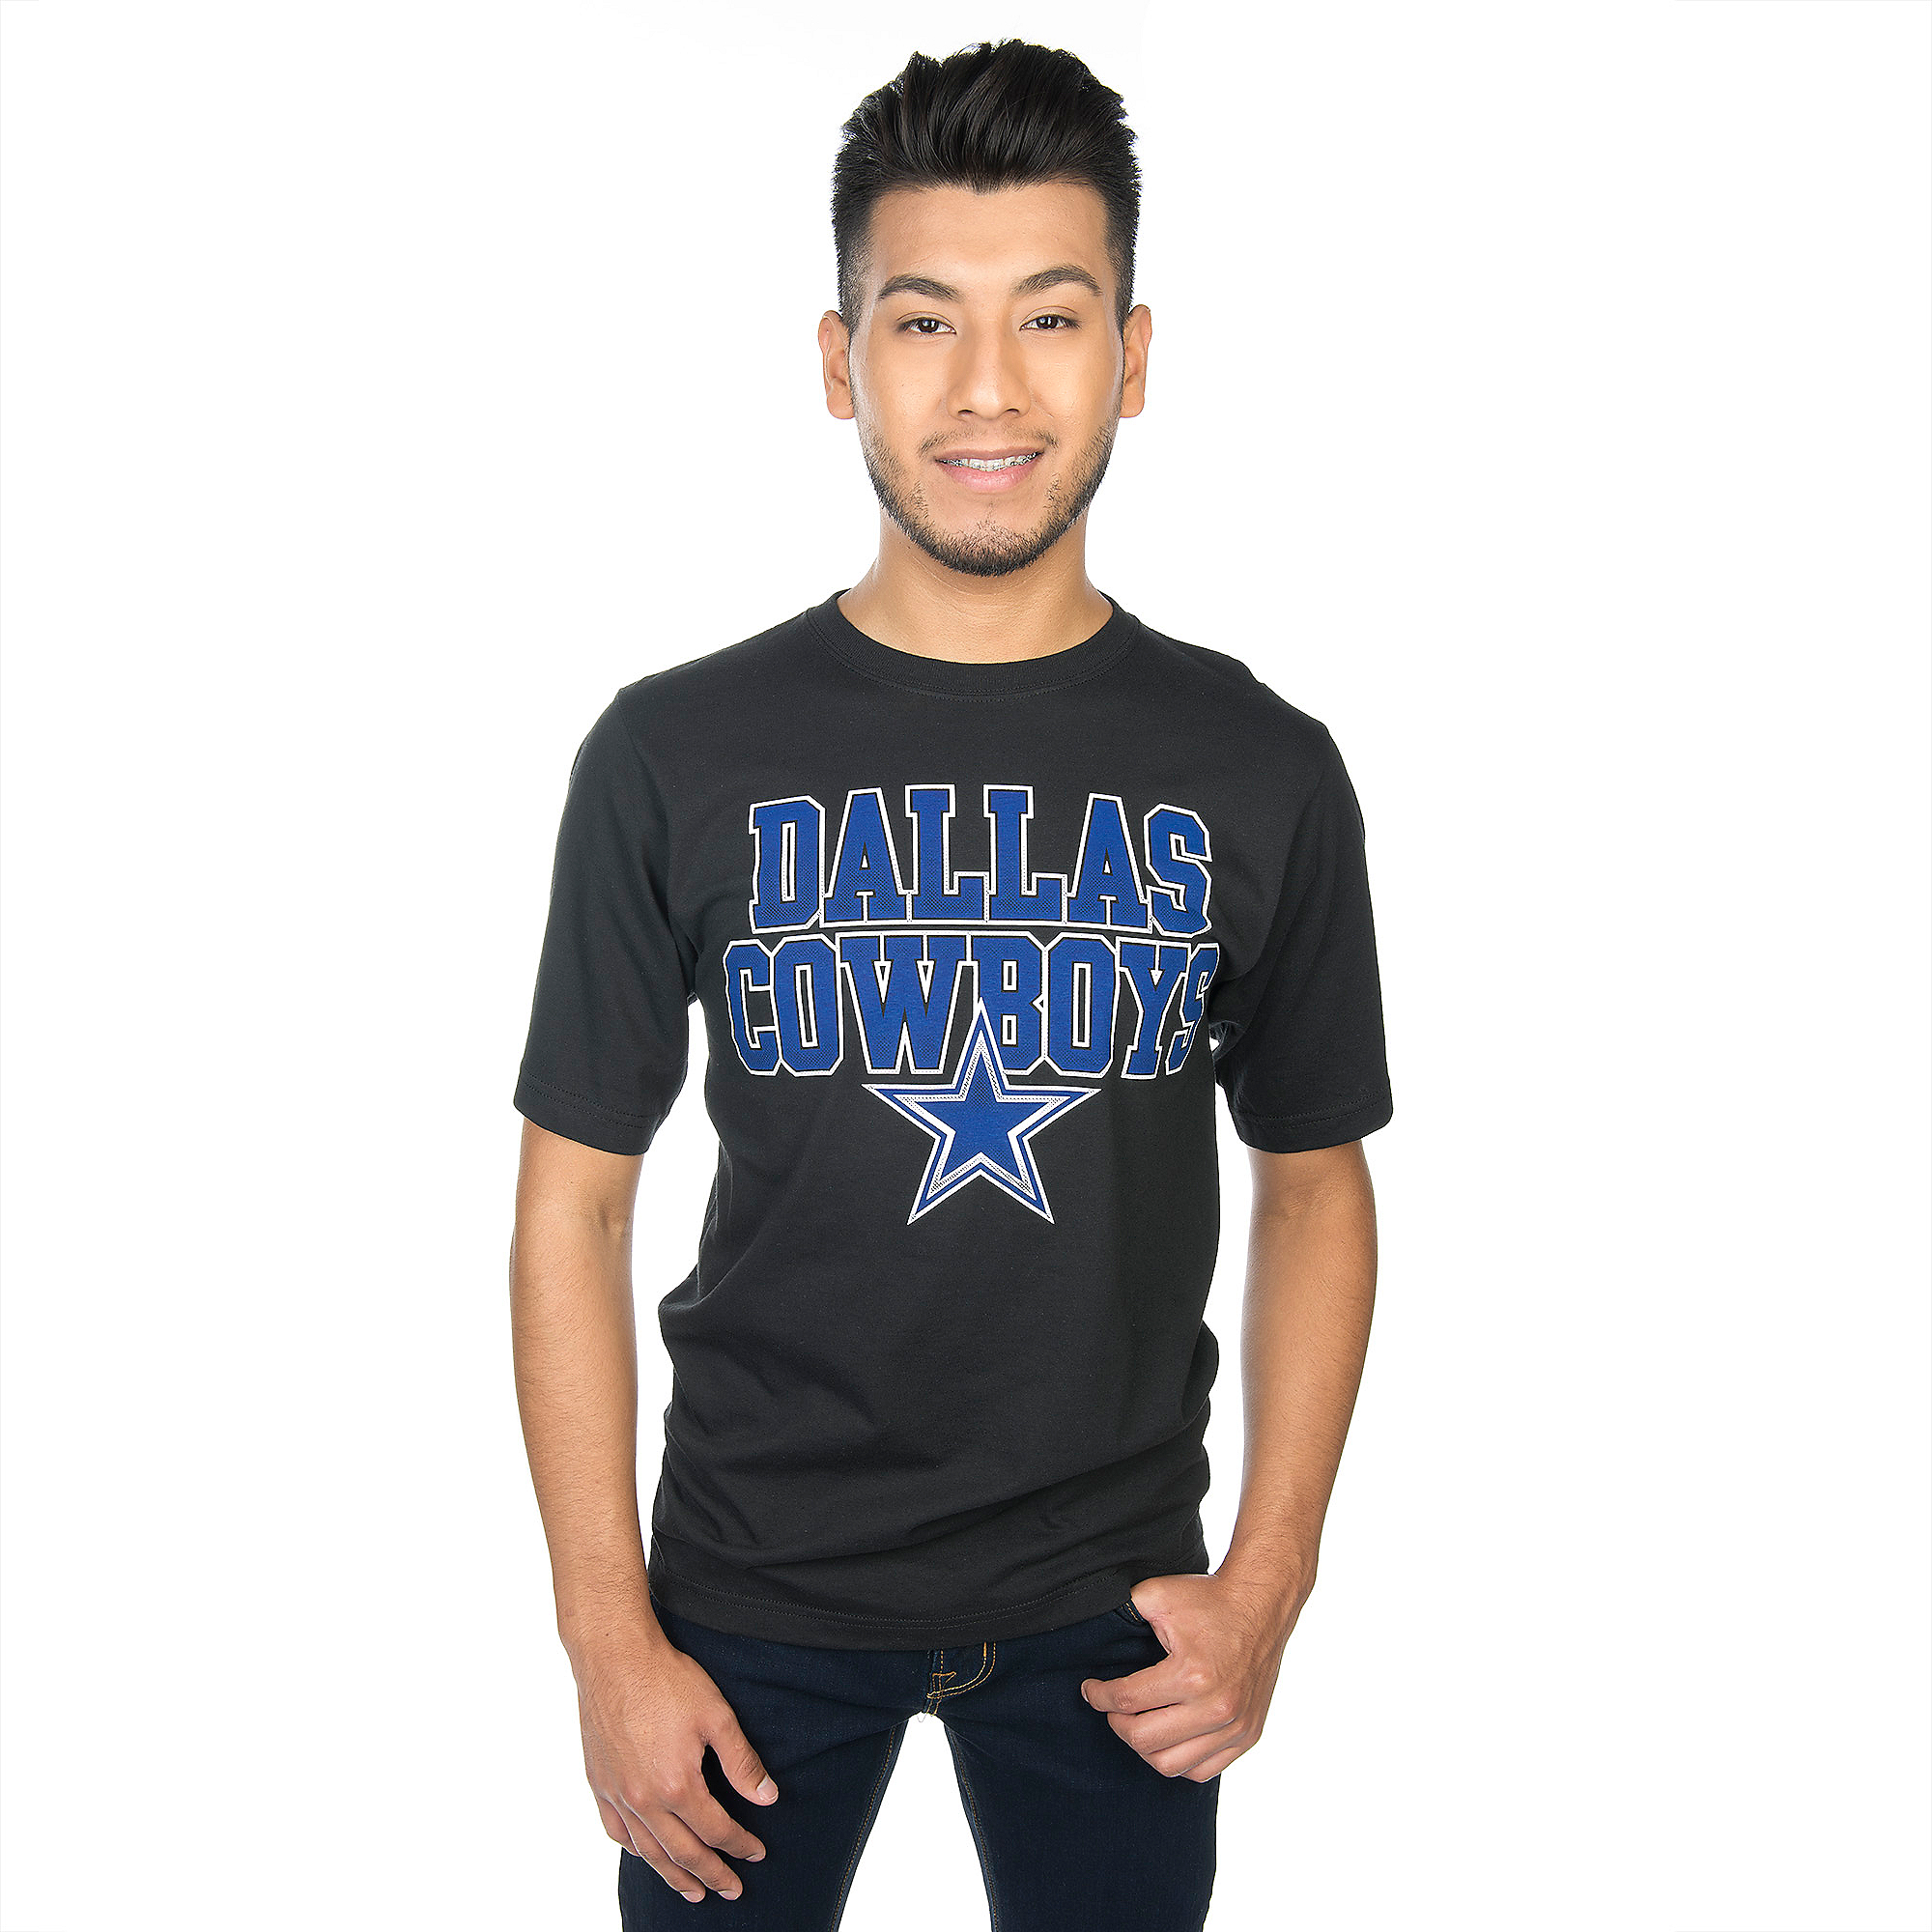 Dallas Cowboys Toned Up Tee